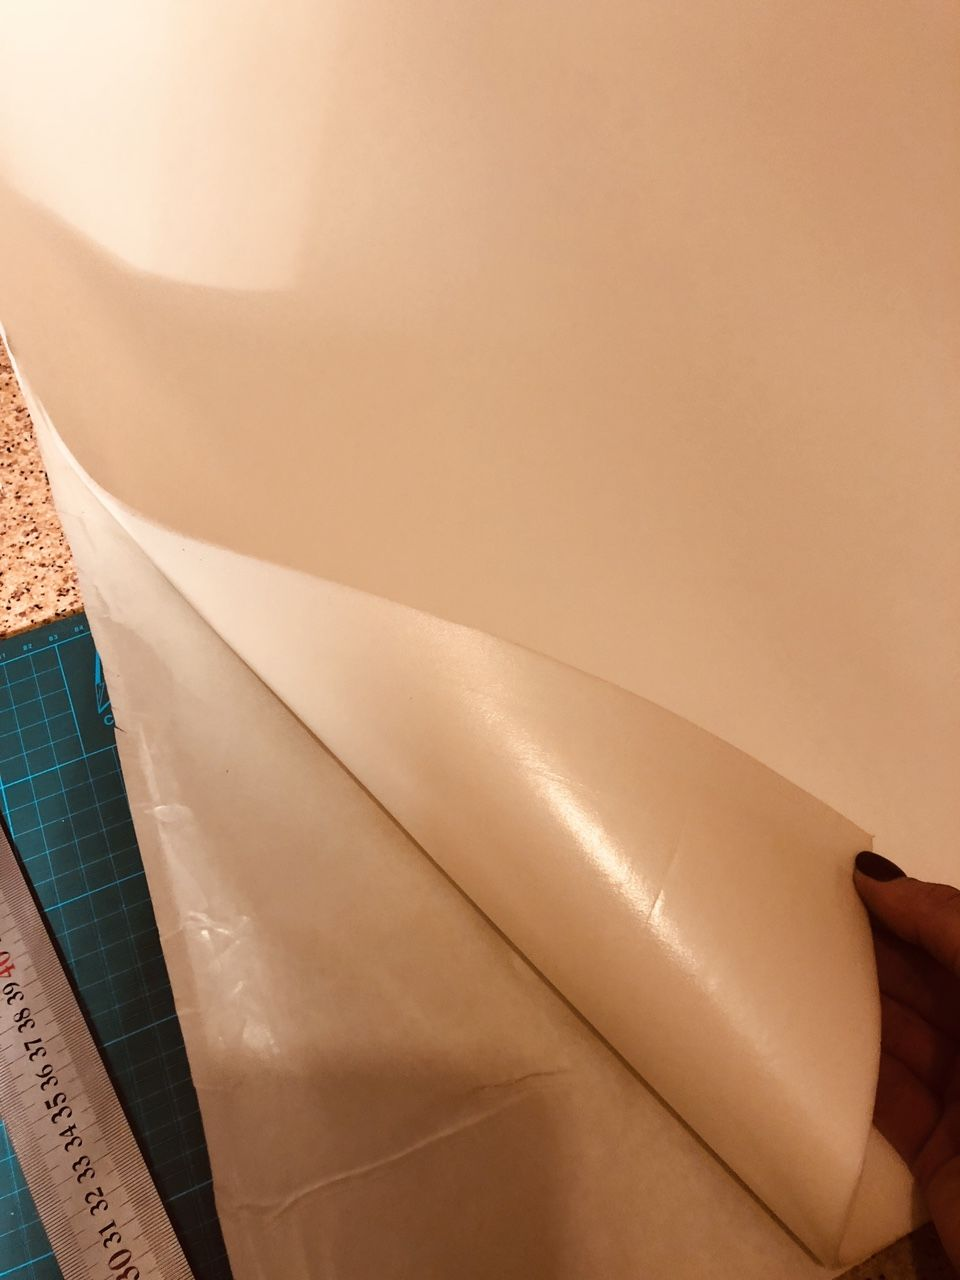 Изолон клеевой 2 мм. Италия, Материалы, Санкт-Петербург,  Фото №1